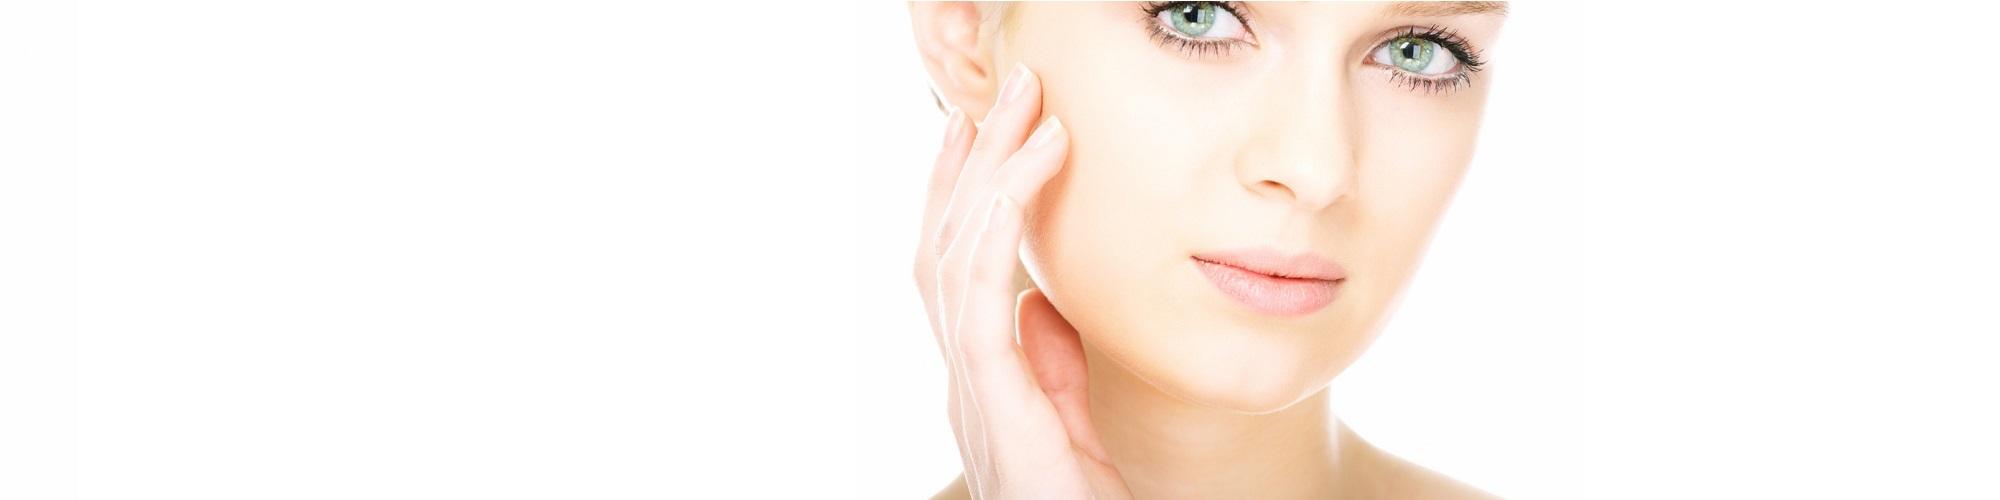 zigomi acido ialuronico catania chirurgia plastica youplast